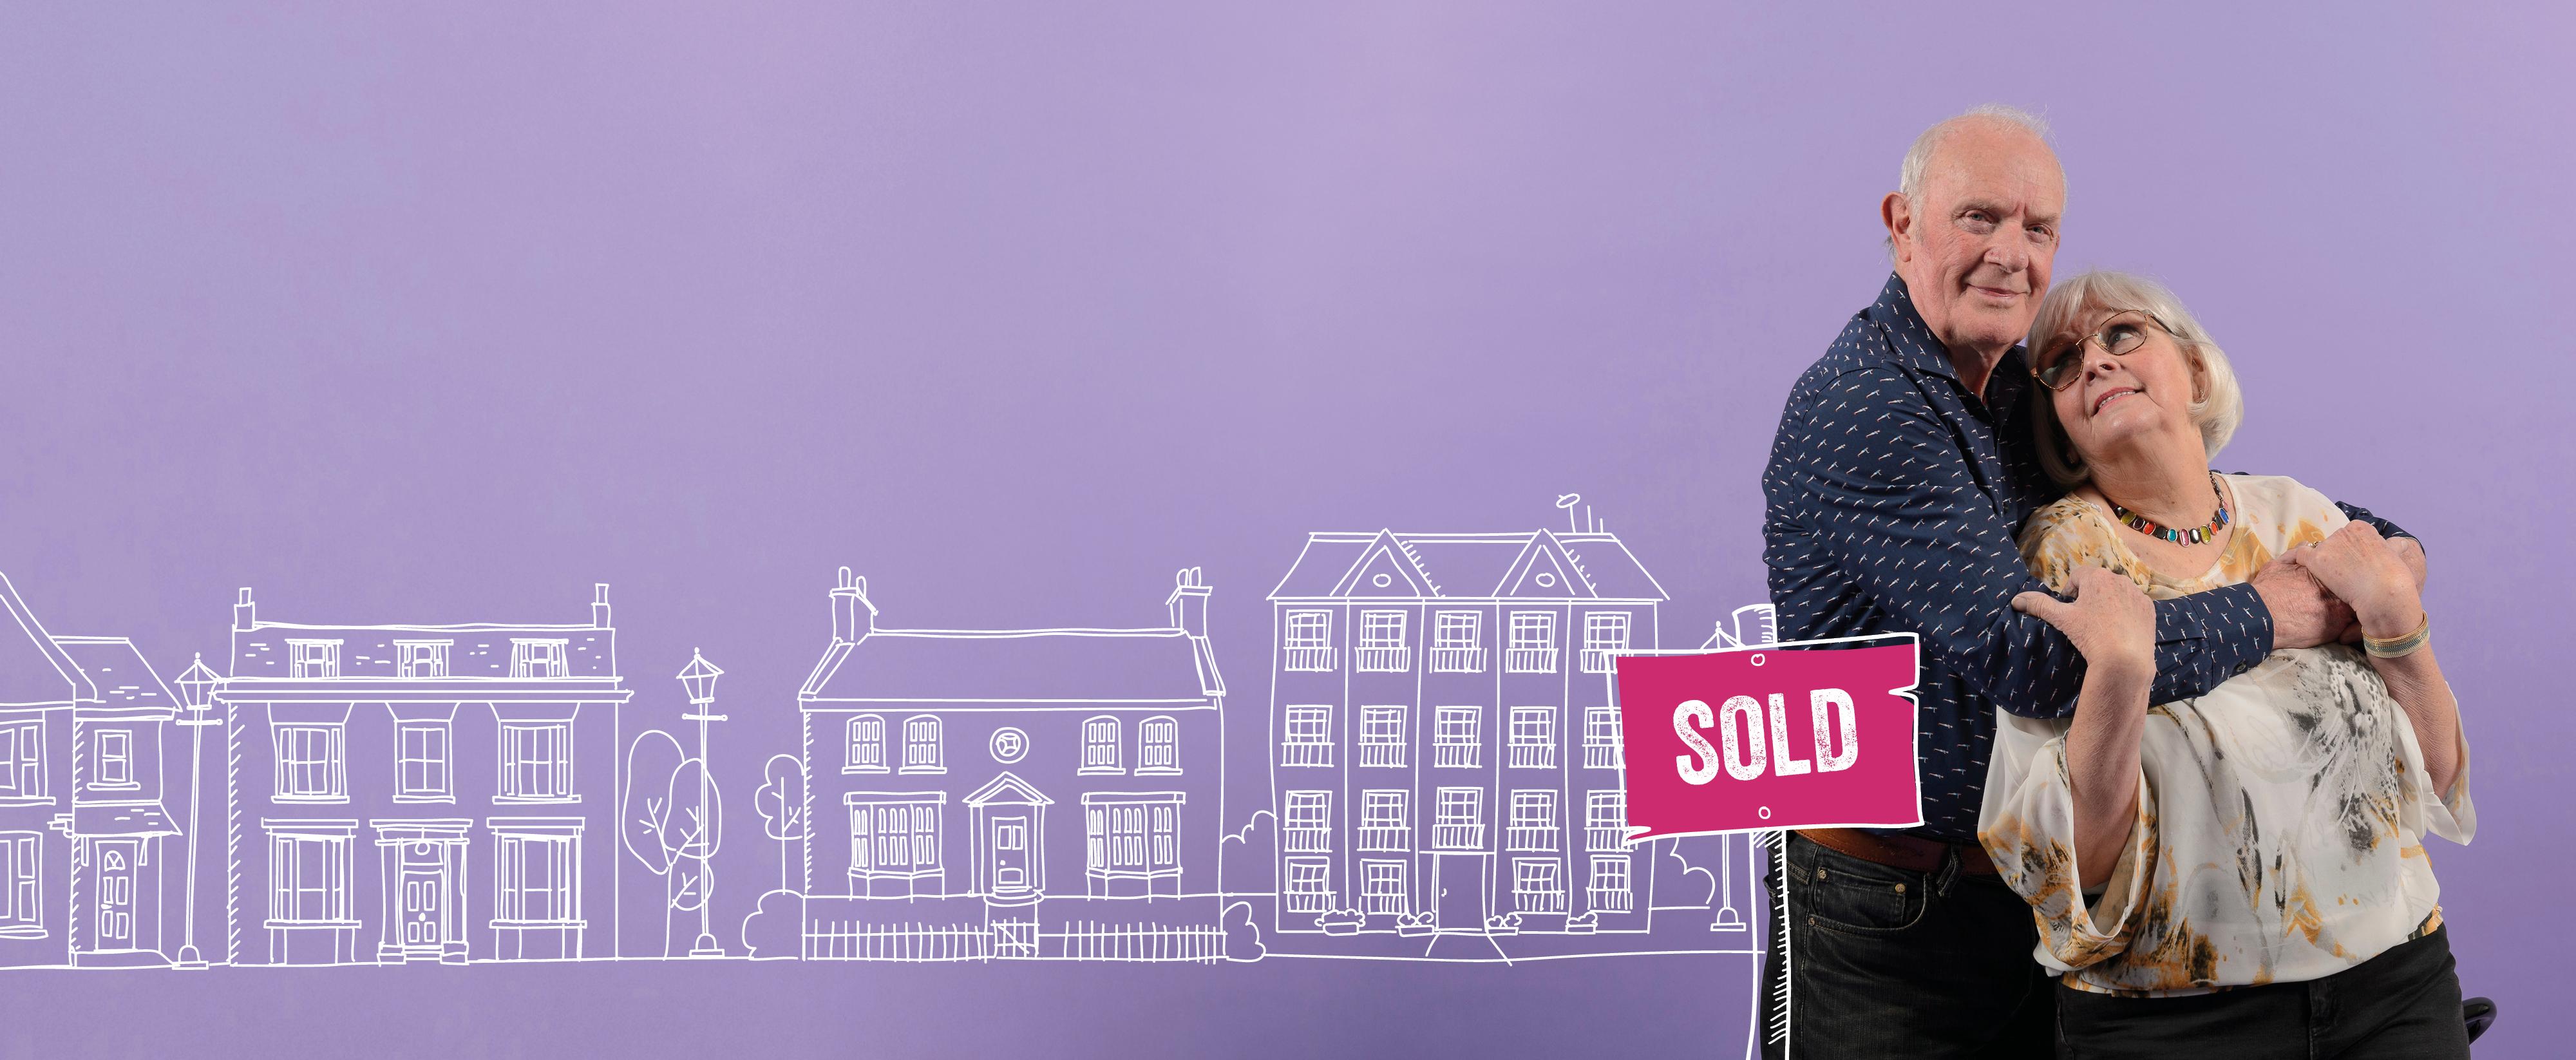 sellers - kates parents - cp banner 2021.jpg